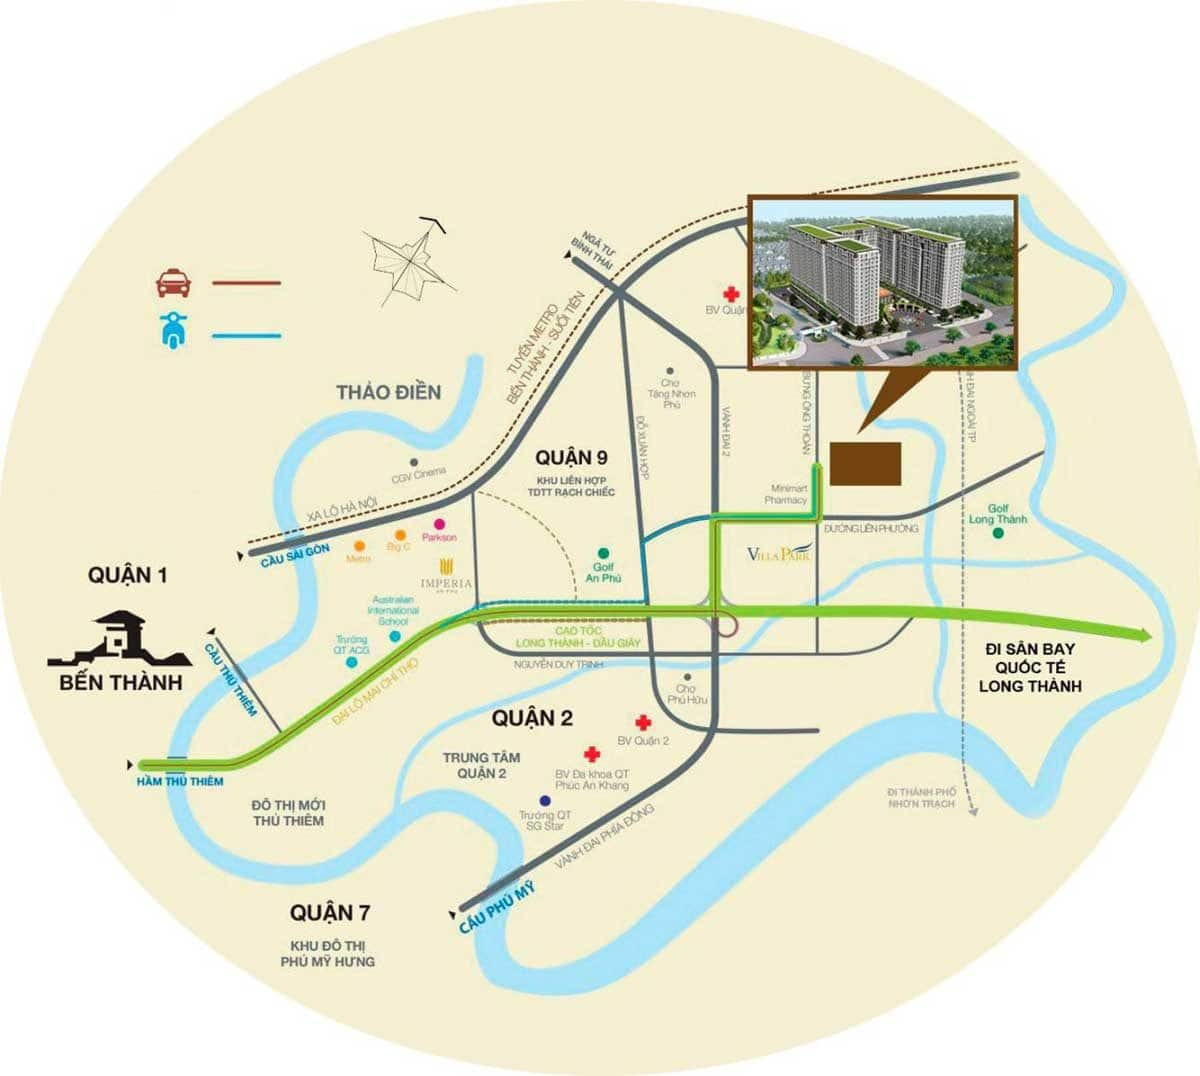 vi tri can ho river park tower - DỰ ÁN CĂN HỘ RIVER PARK TOWER QUẬN 9